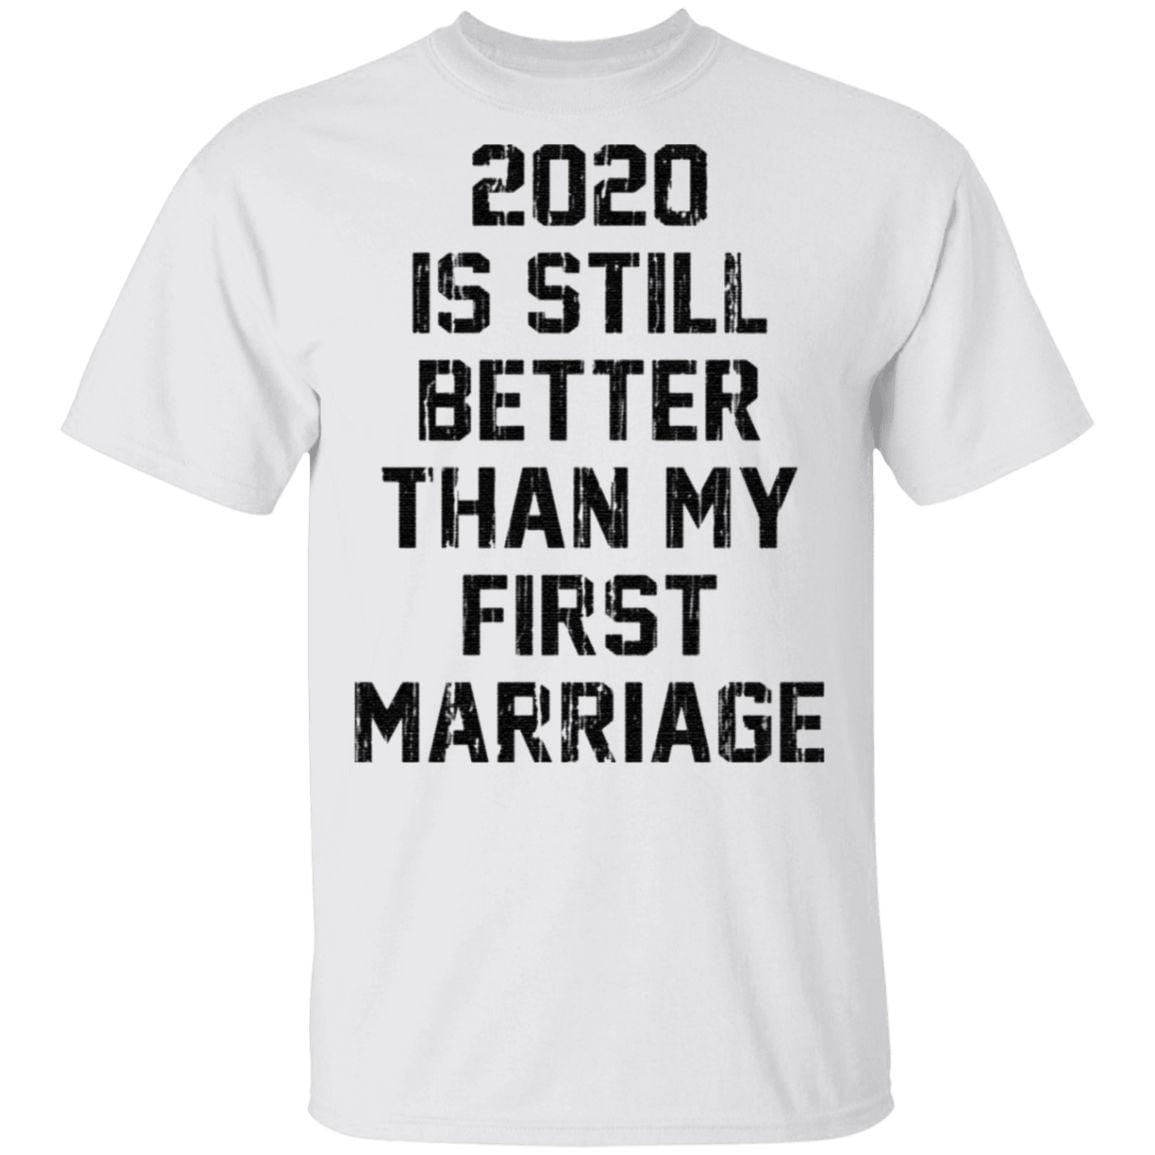 2020 is still better than my first marriage t shirt